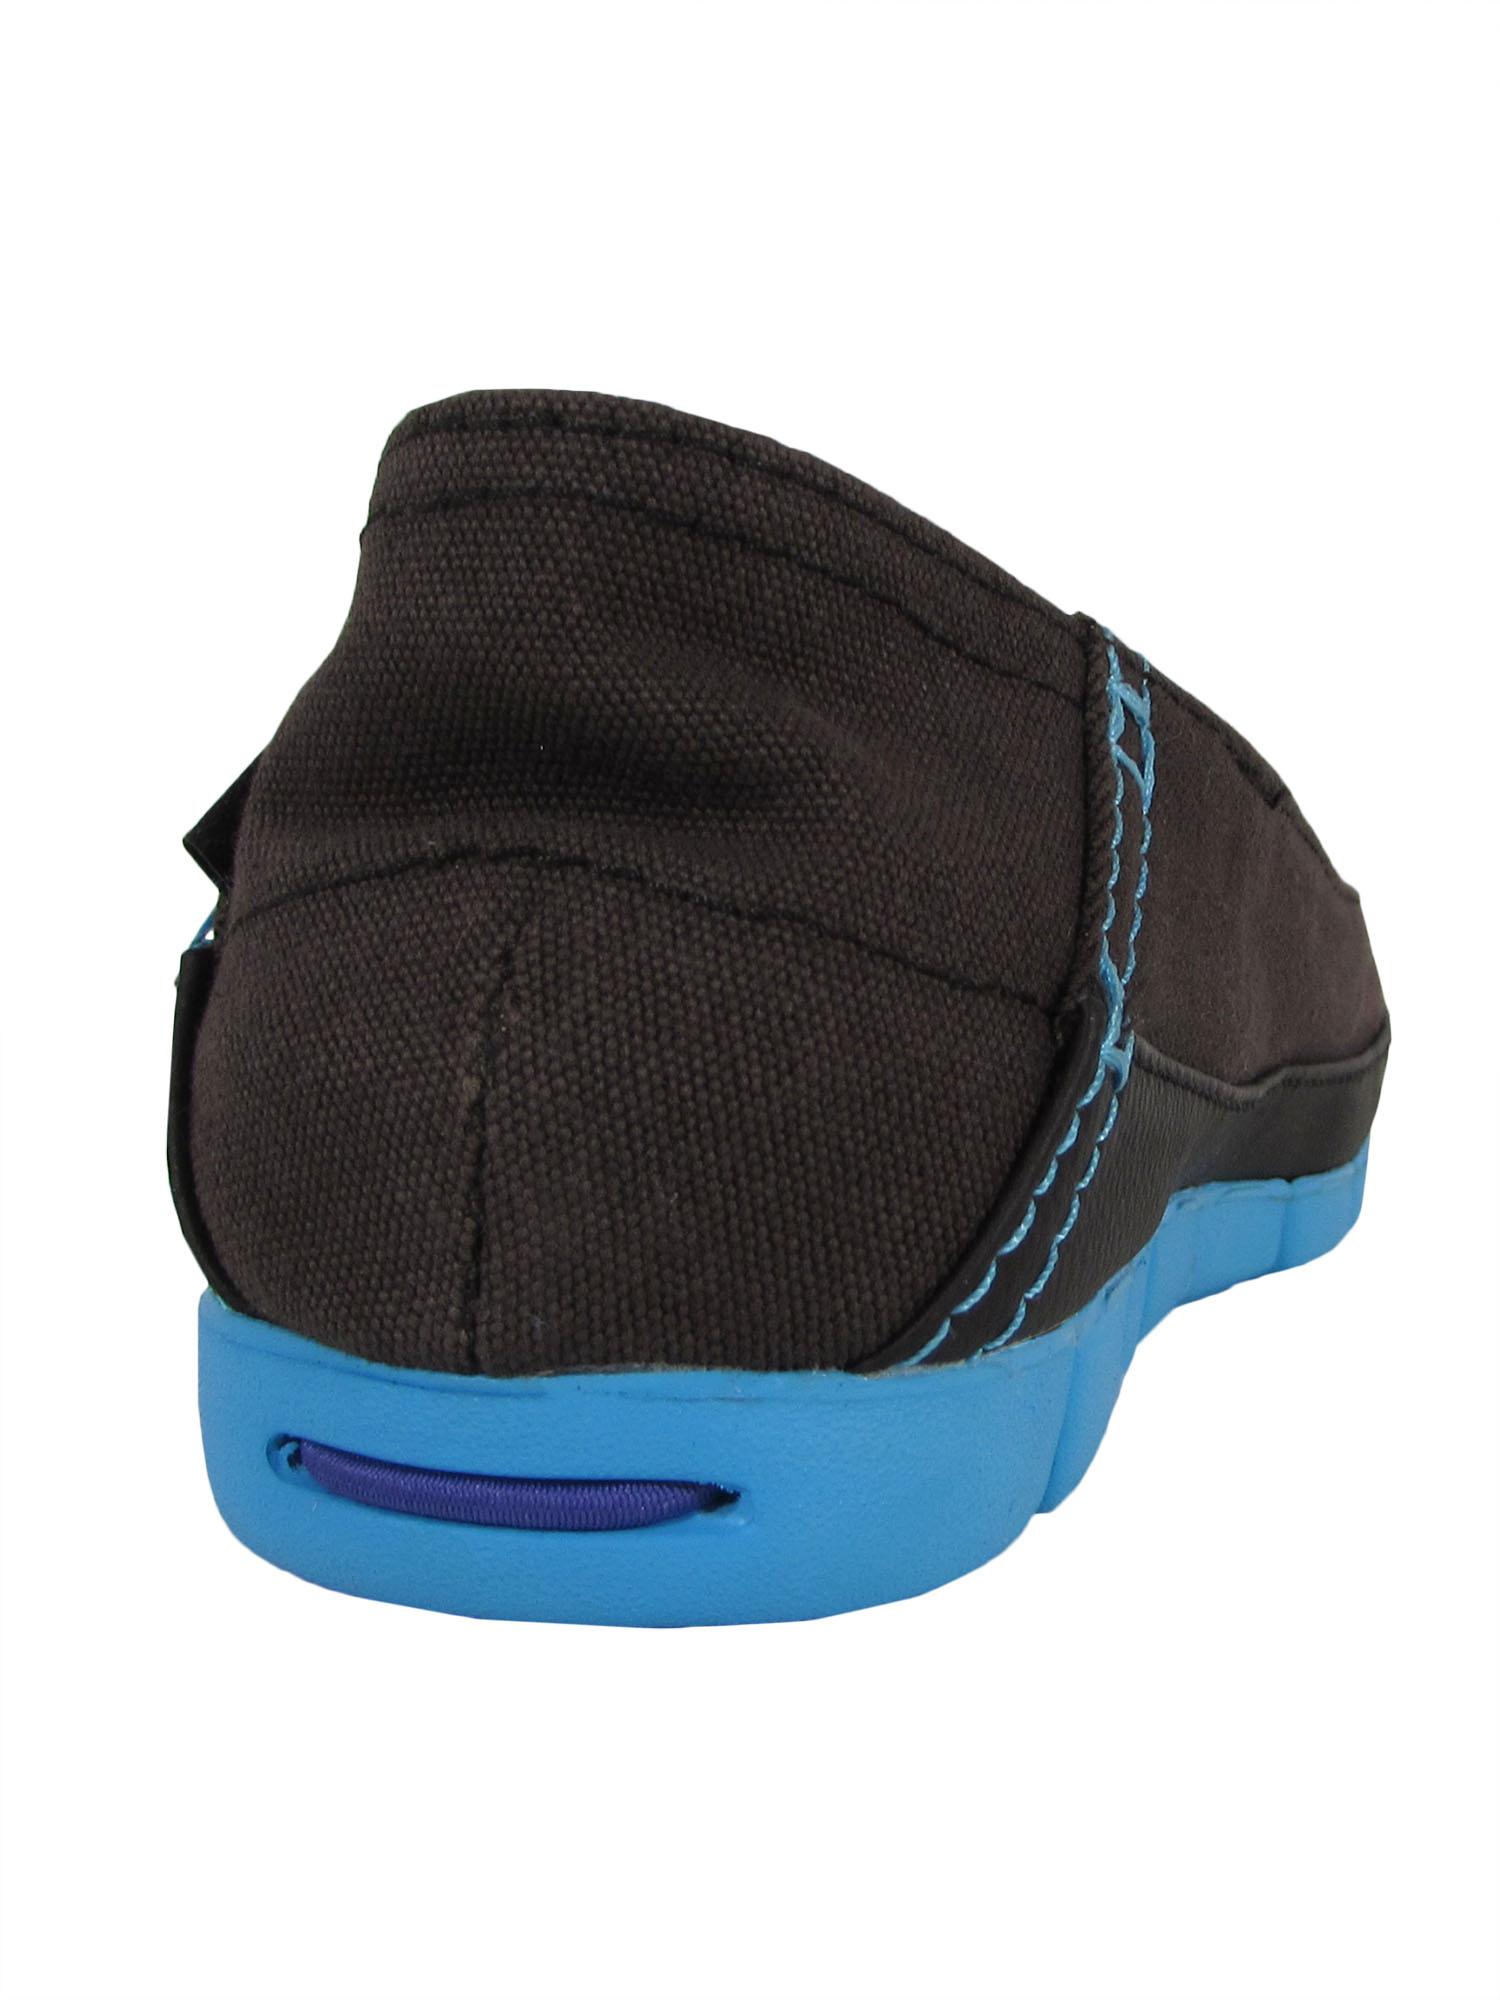 Crocs-Womens-Stretch-Sole-Flat-Slip-On-Shoes thumbnail 8